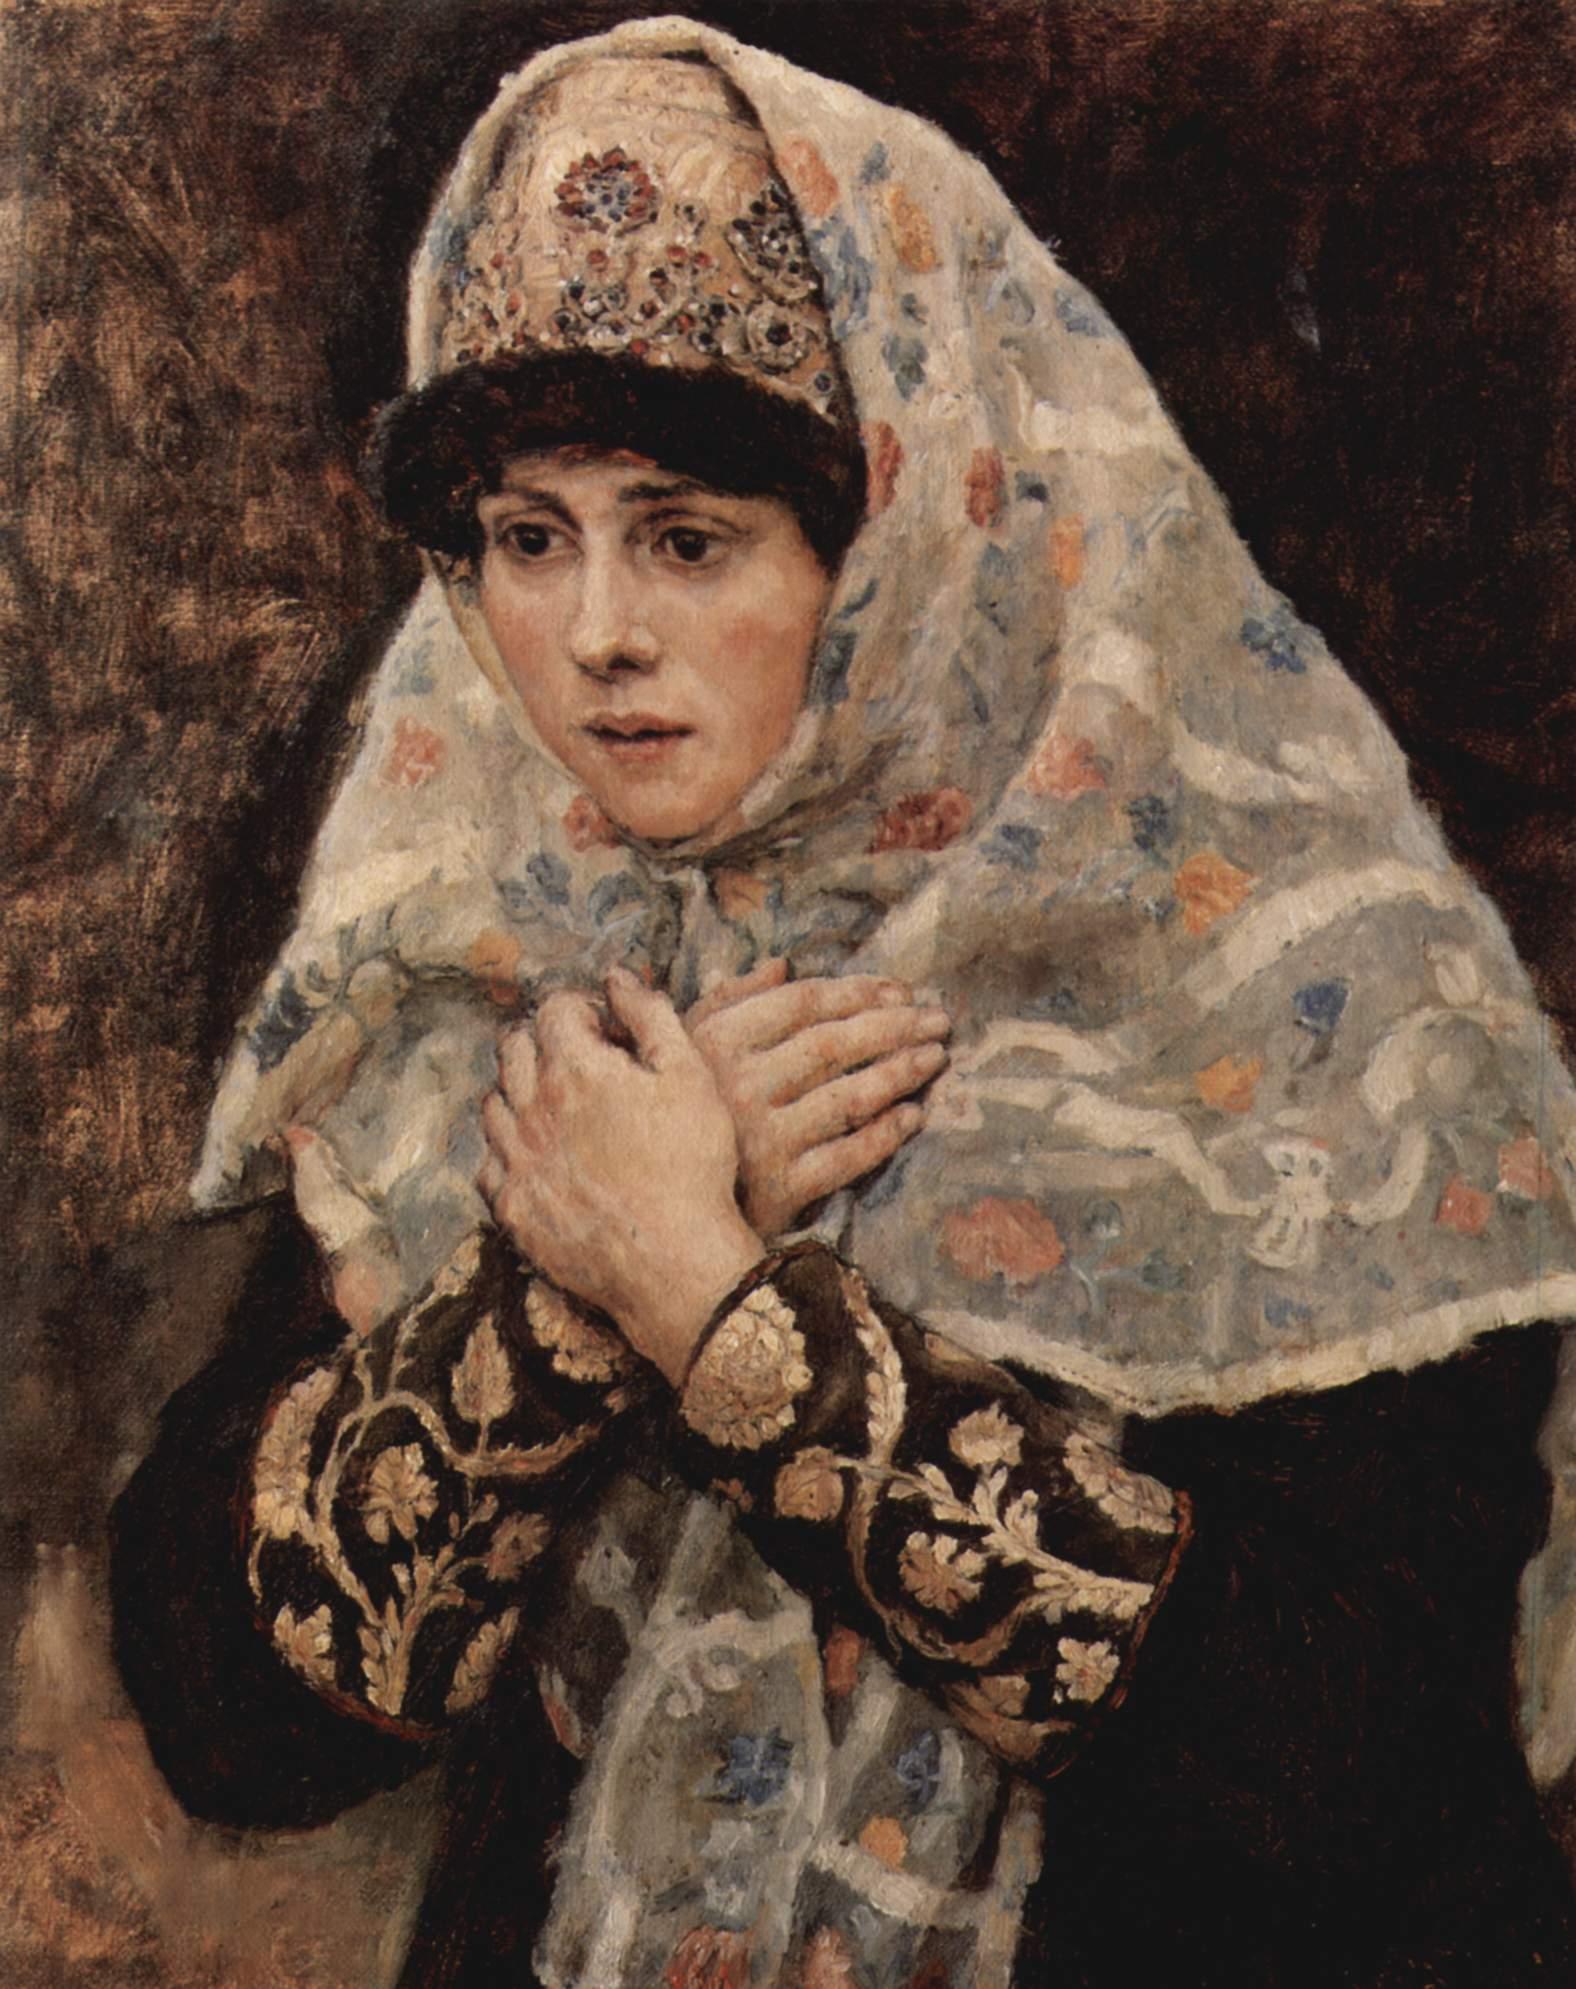 https://upload.wikimedia.org/wikipedia/commons/e/e7/Boyaryna_Morozova_by_V.Surikov_-_sketch_03_%28Tretyakov_gallery%29.jpg